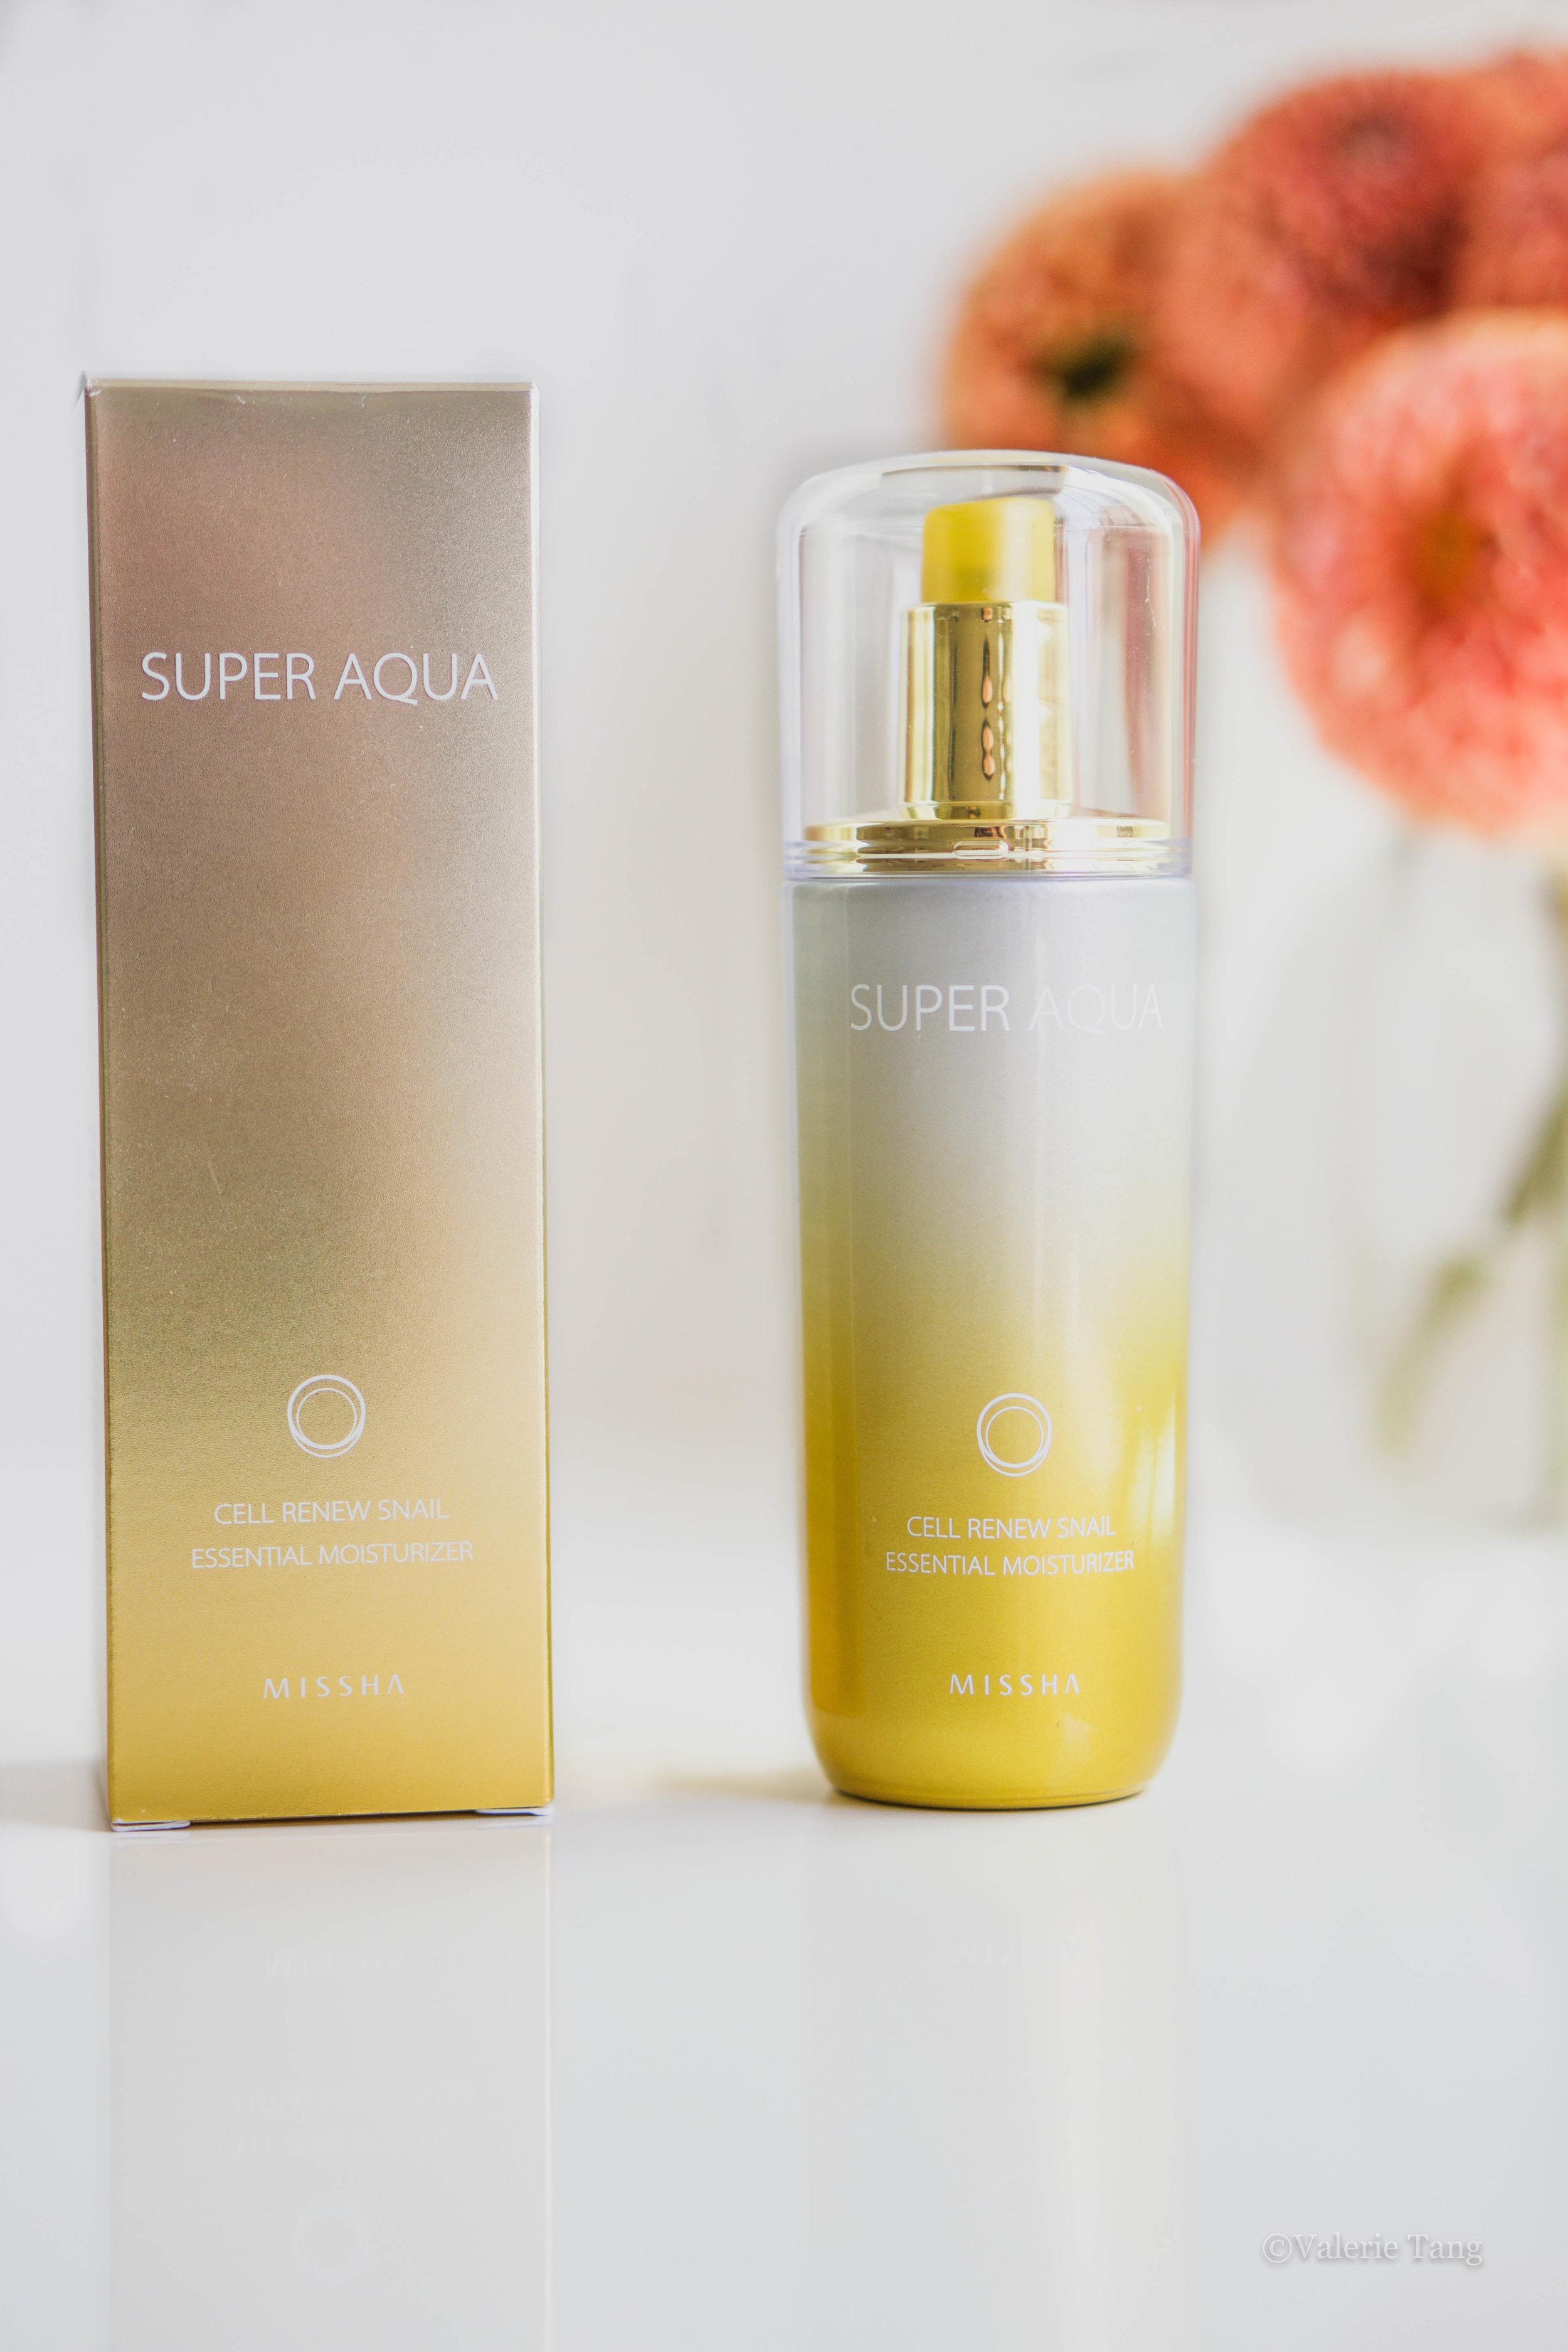 Missha Super Aqua Cell Renew Snail Essential Moisturizer Review_DSC09751.jpg